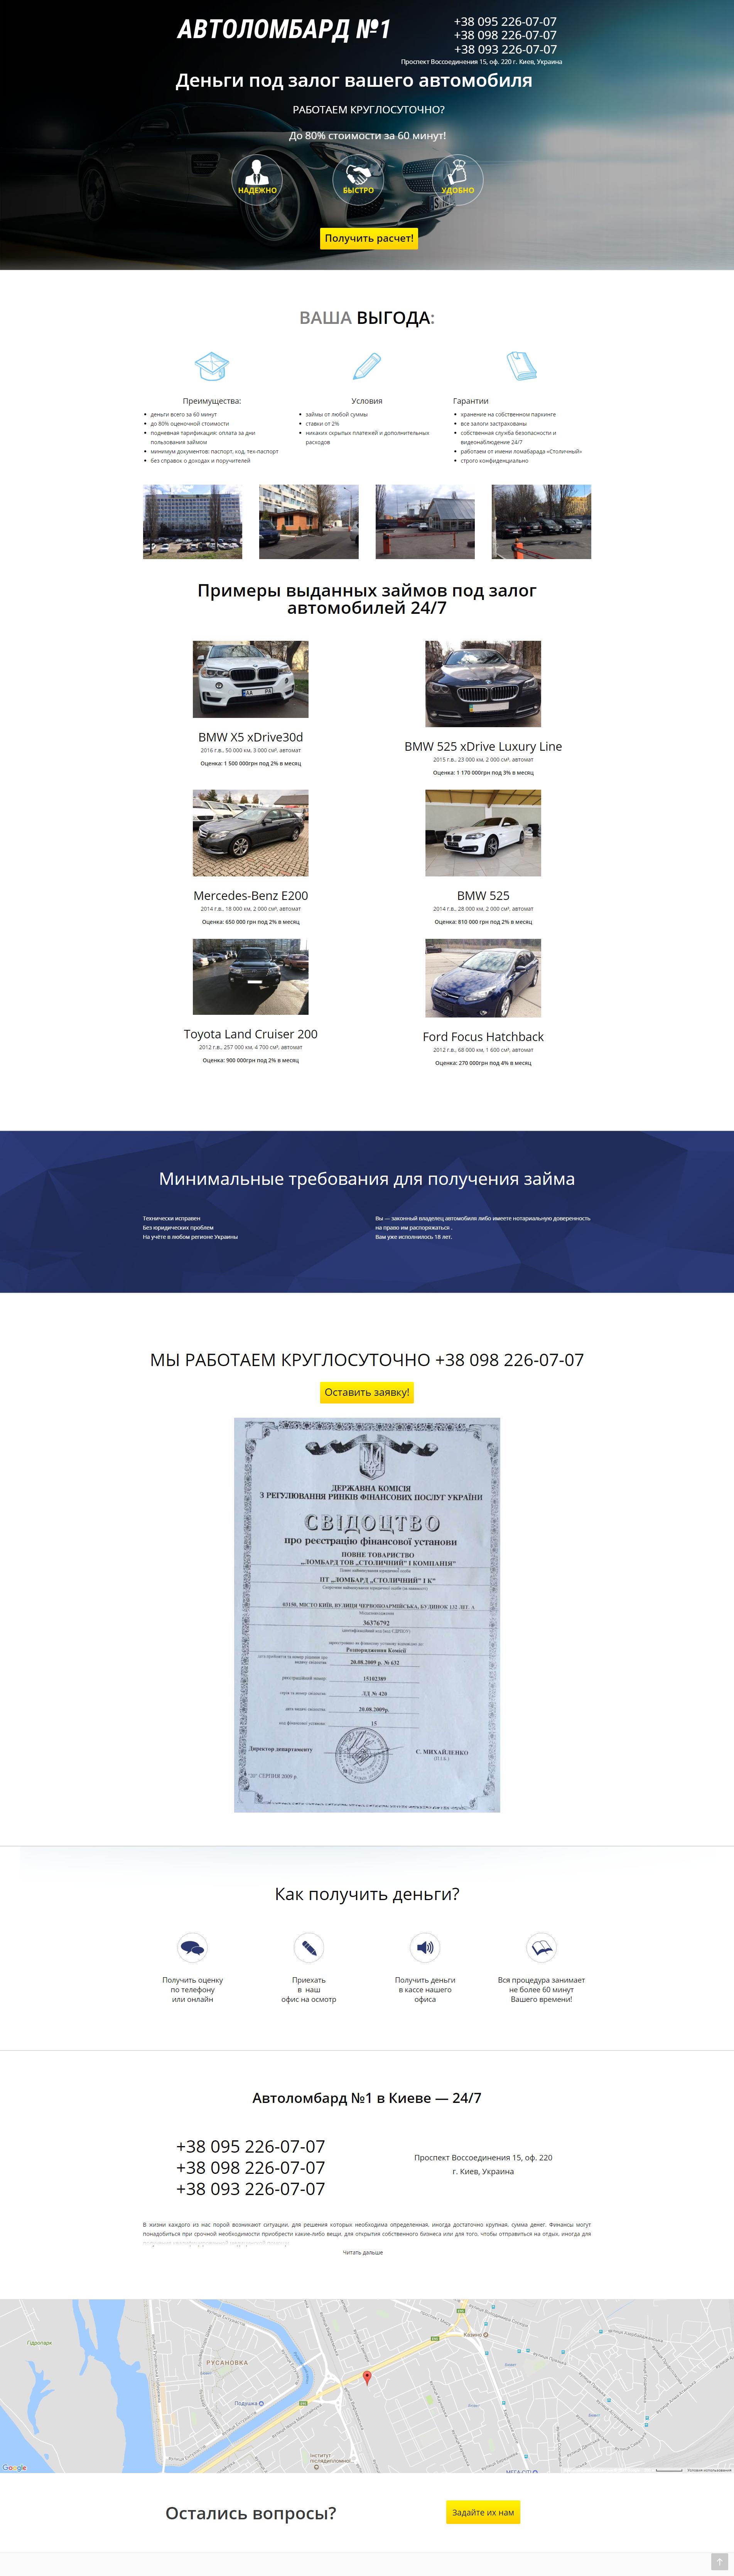 Компания «Автоломбард №1»